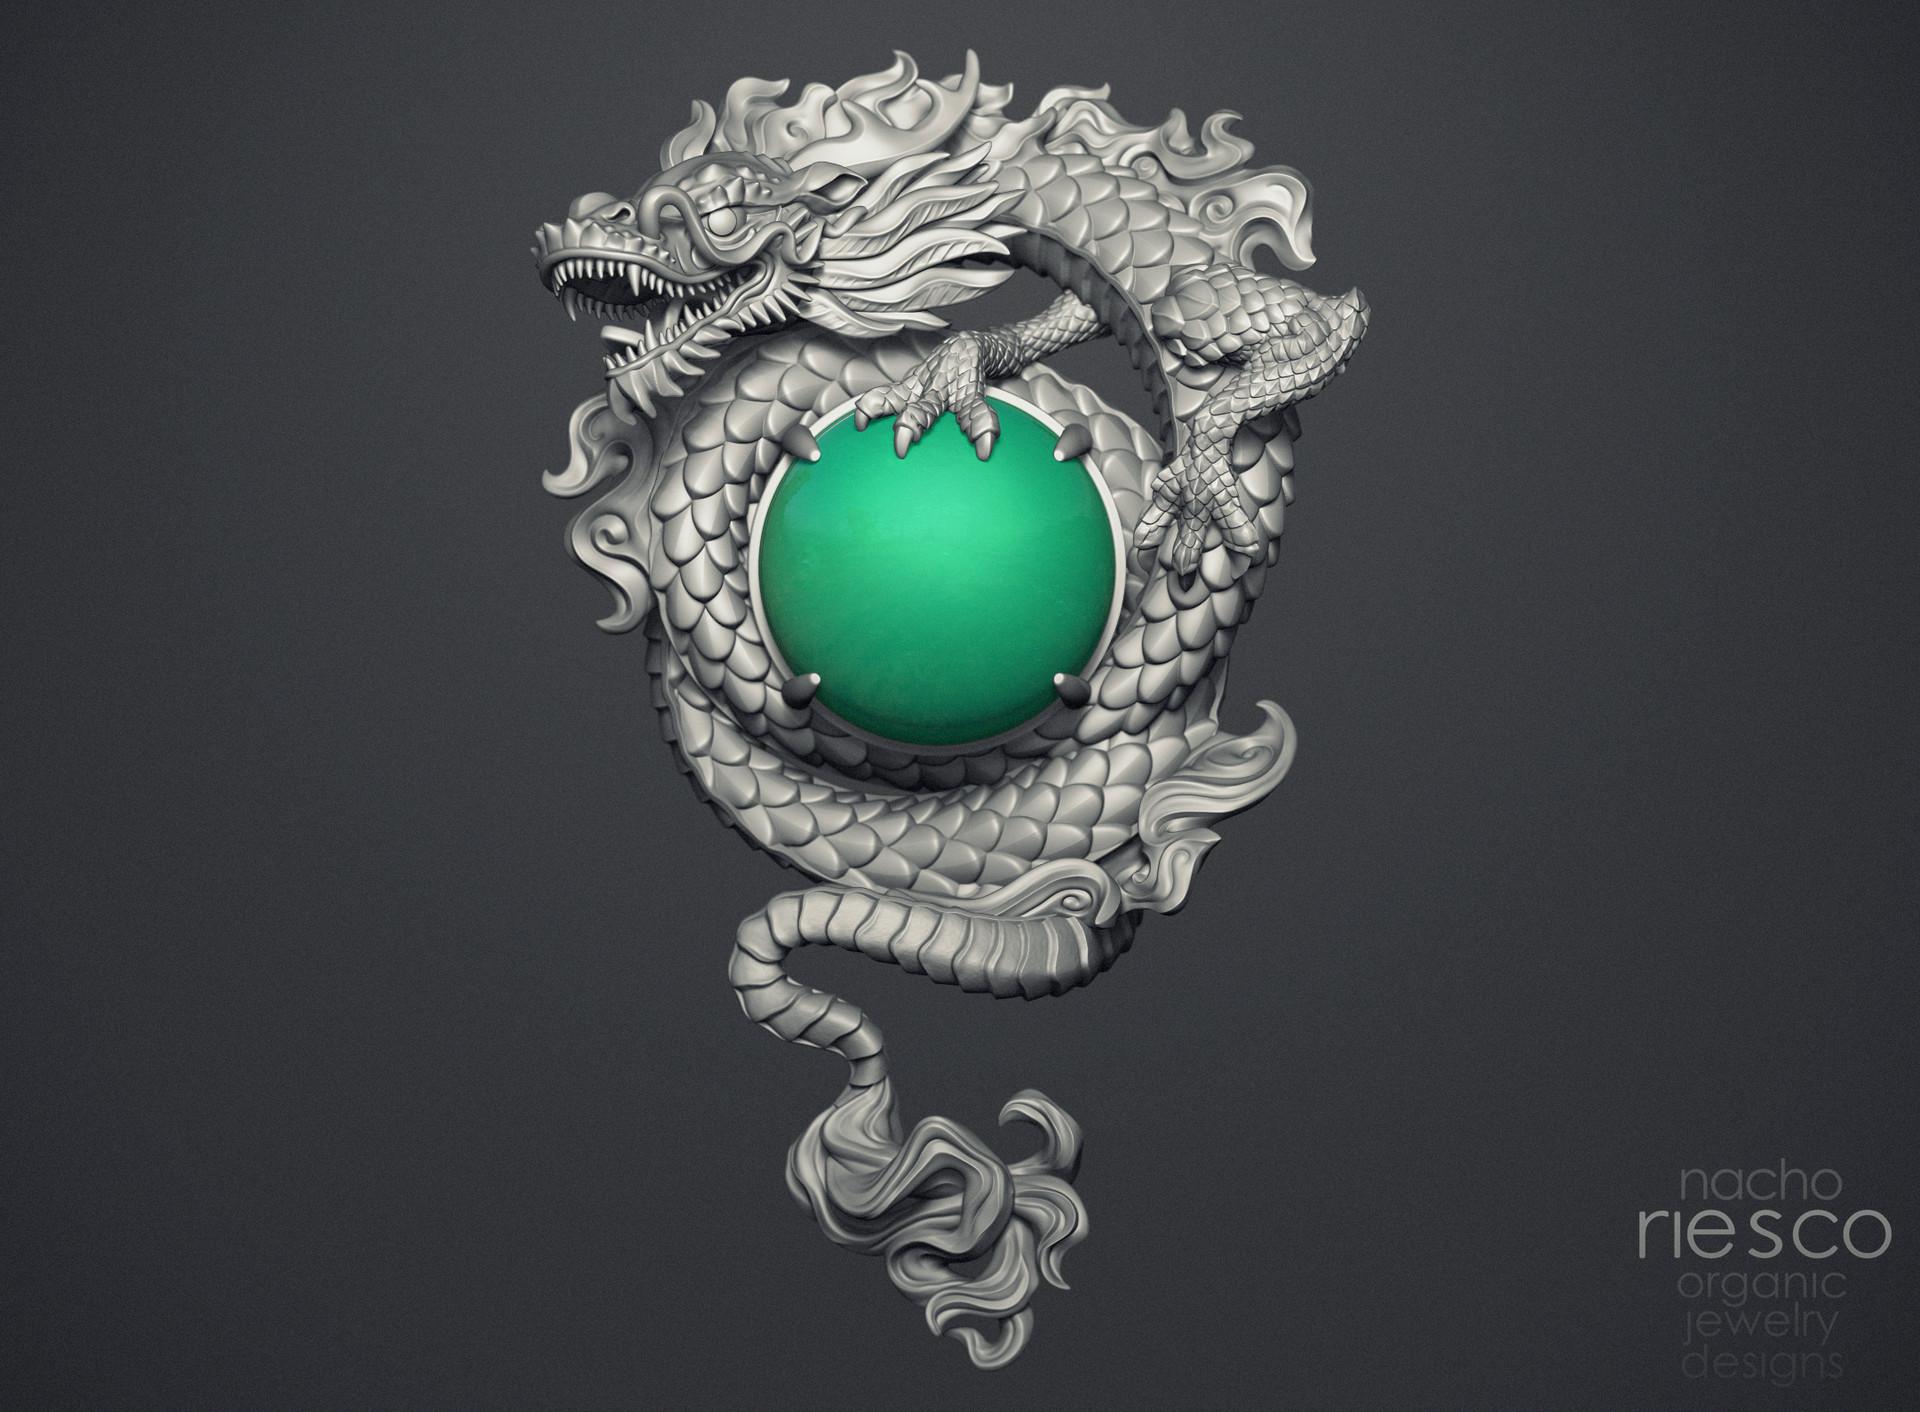 Nacho riesco gostanza colgante dragon y jade zbr